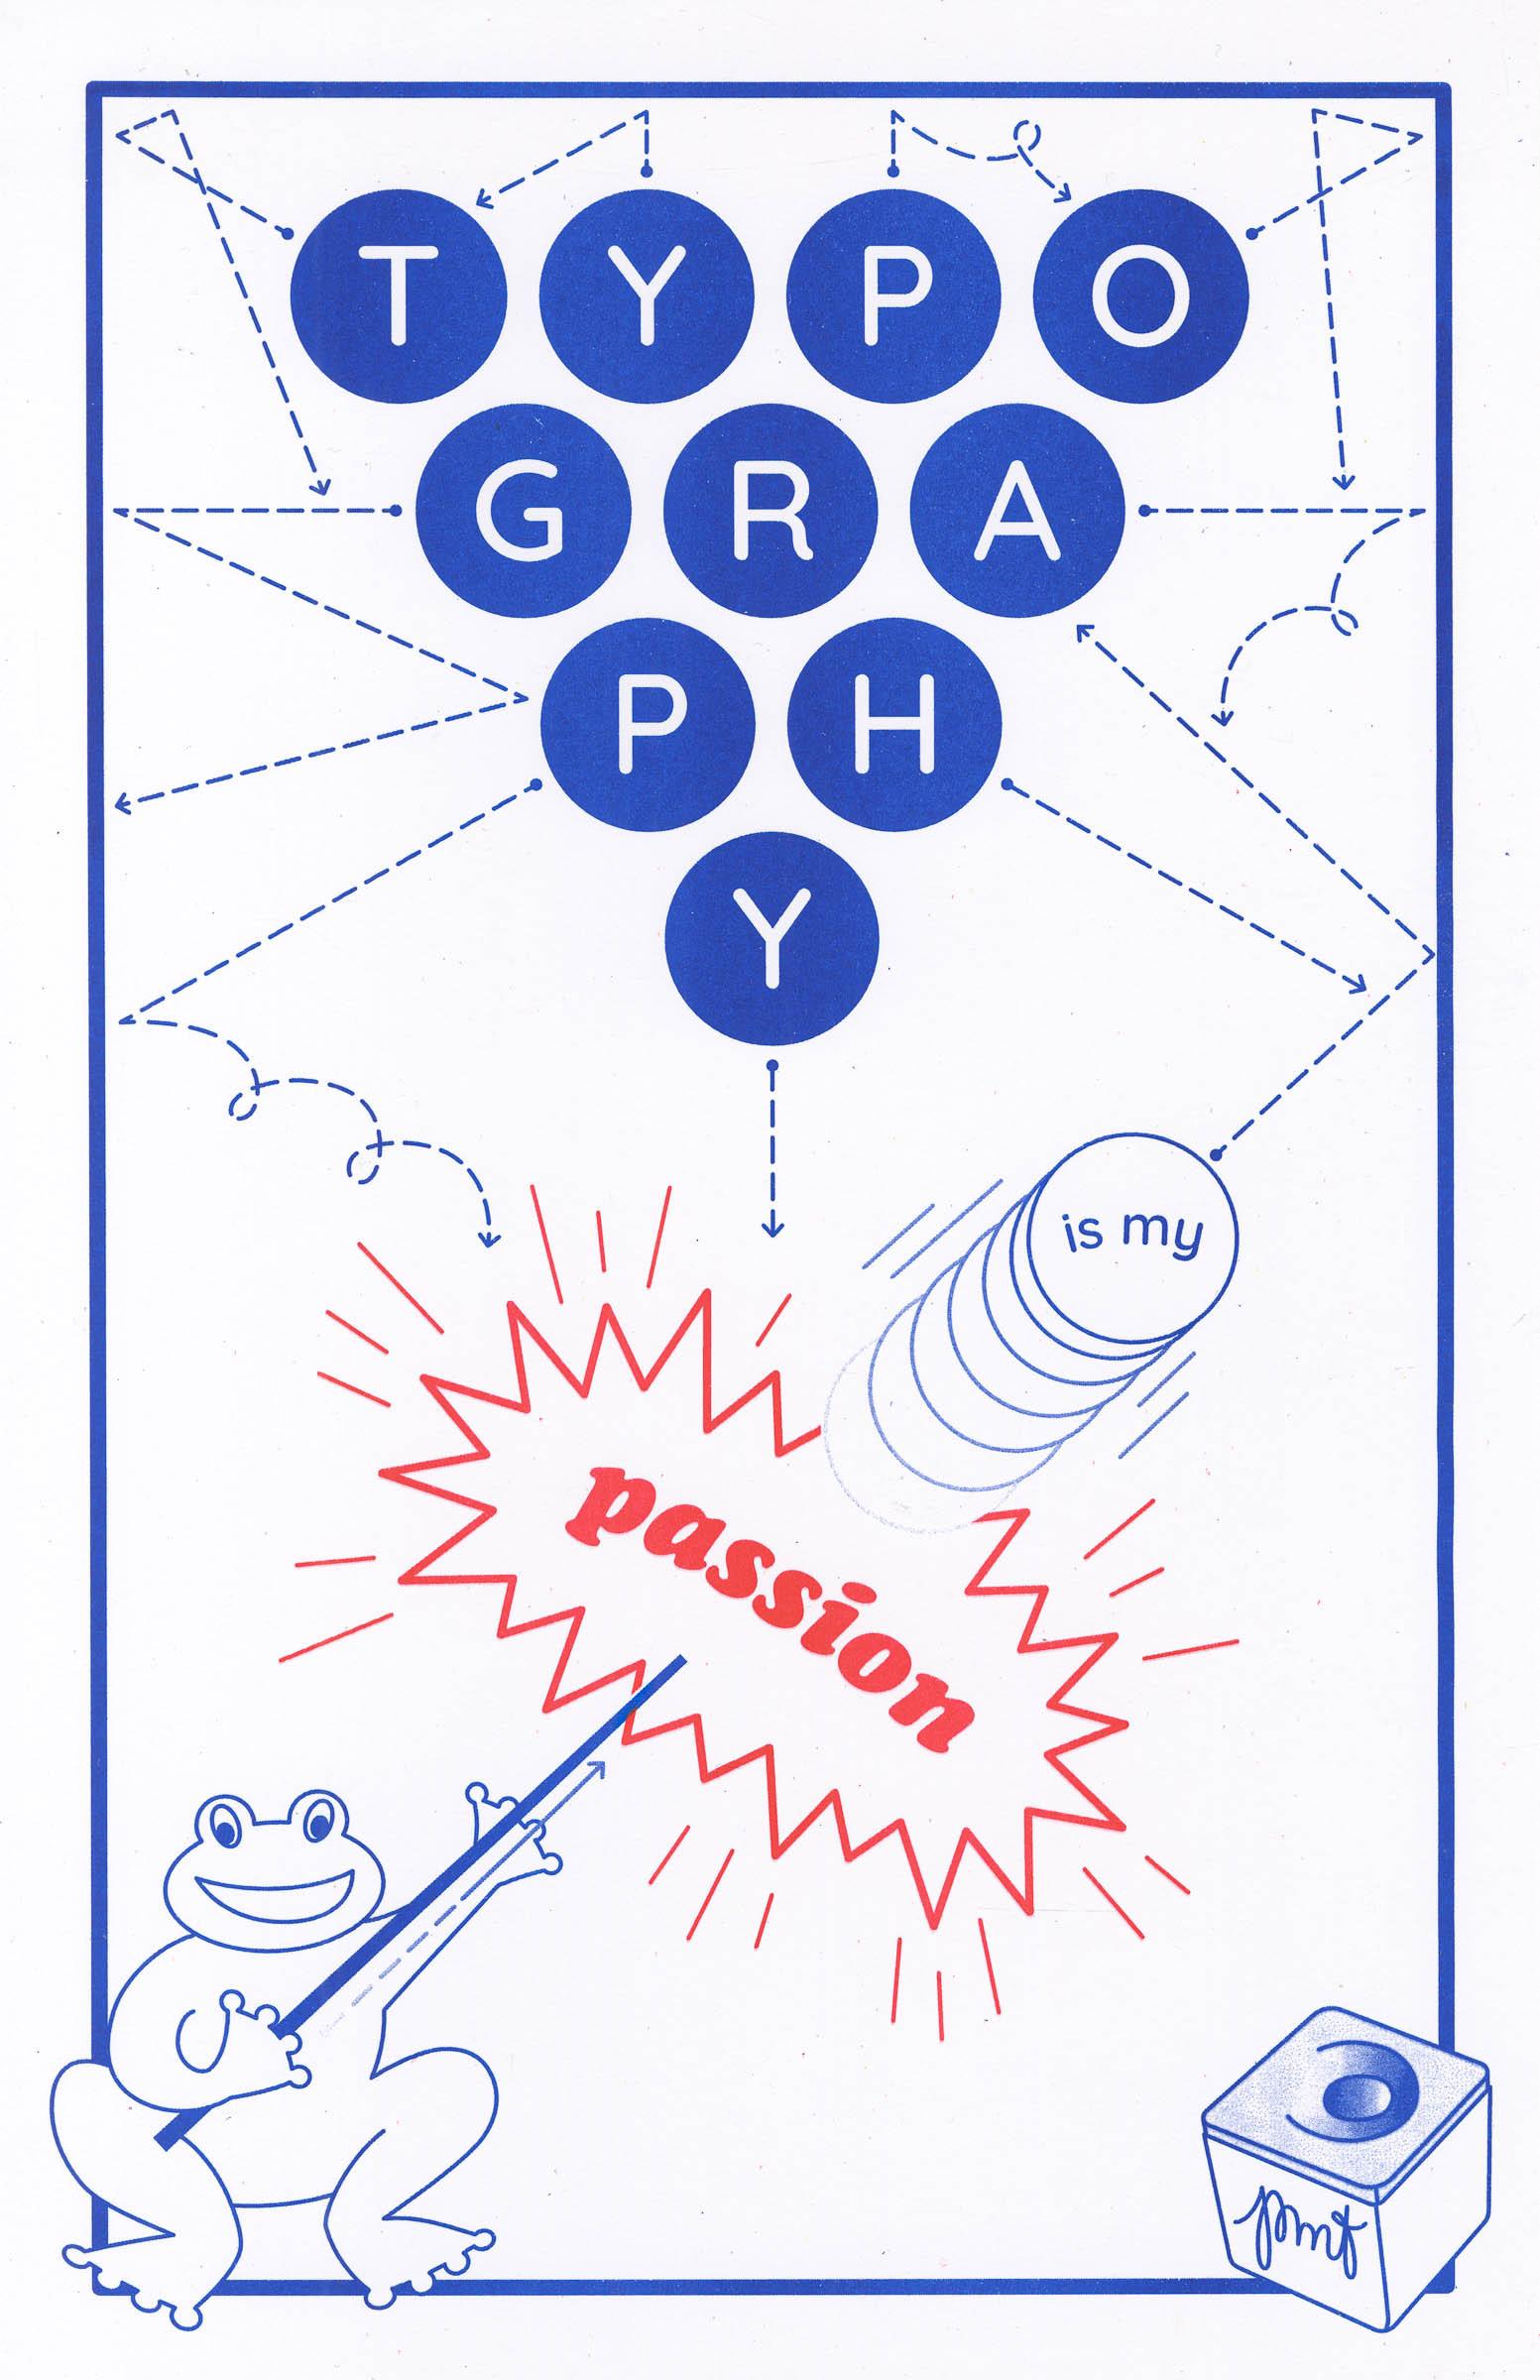 triet-pham-print-poster-design-1.jpg